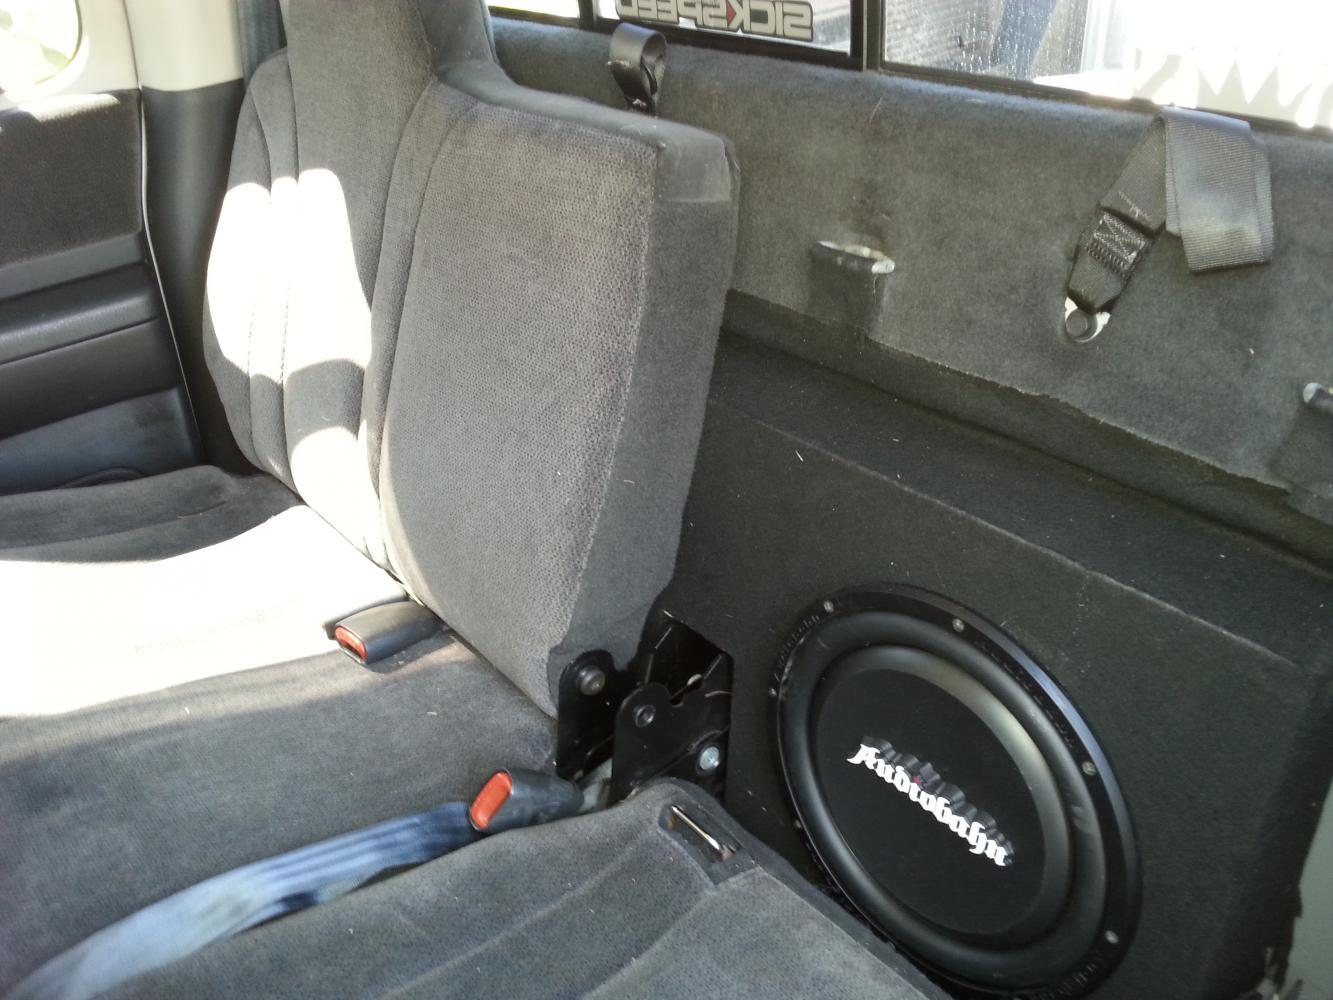 D Custom Dual Sub Box Hidden Behind Seats on 06 Dodge Dakota Quad